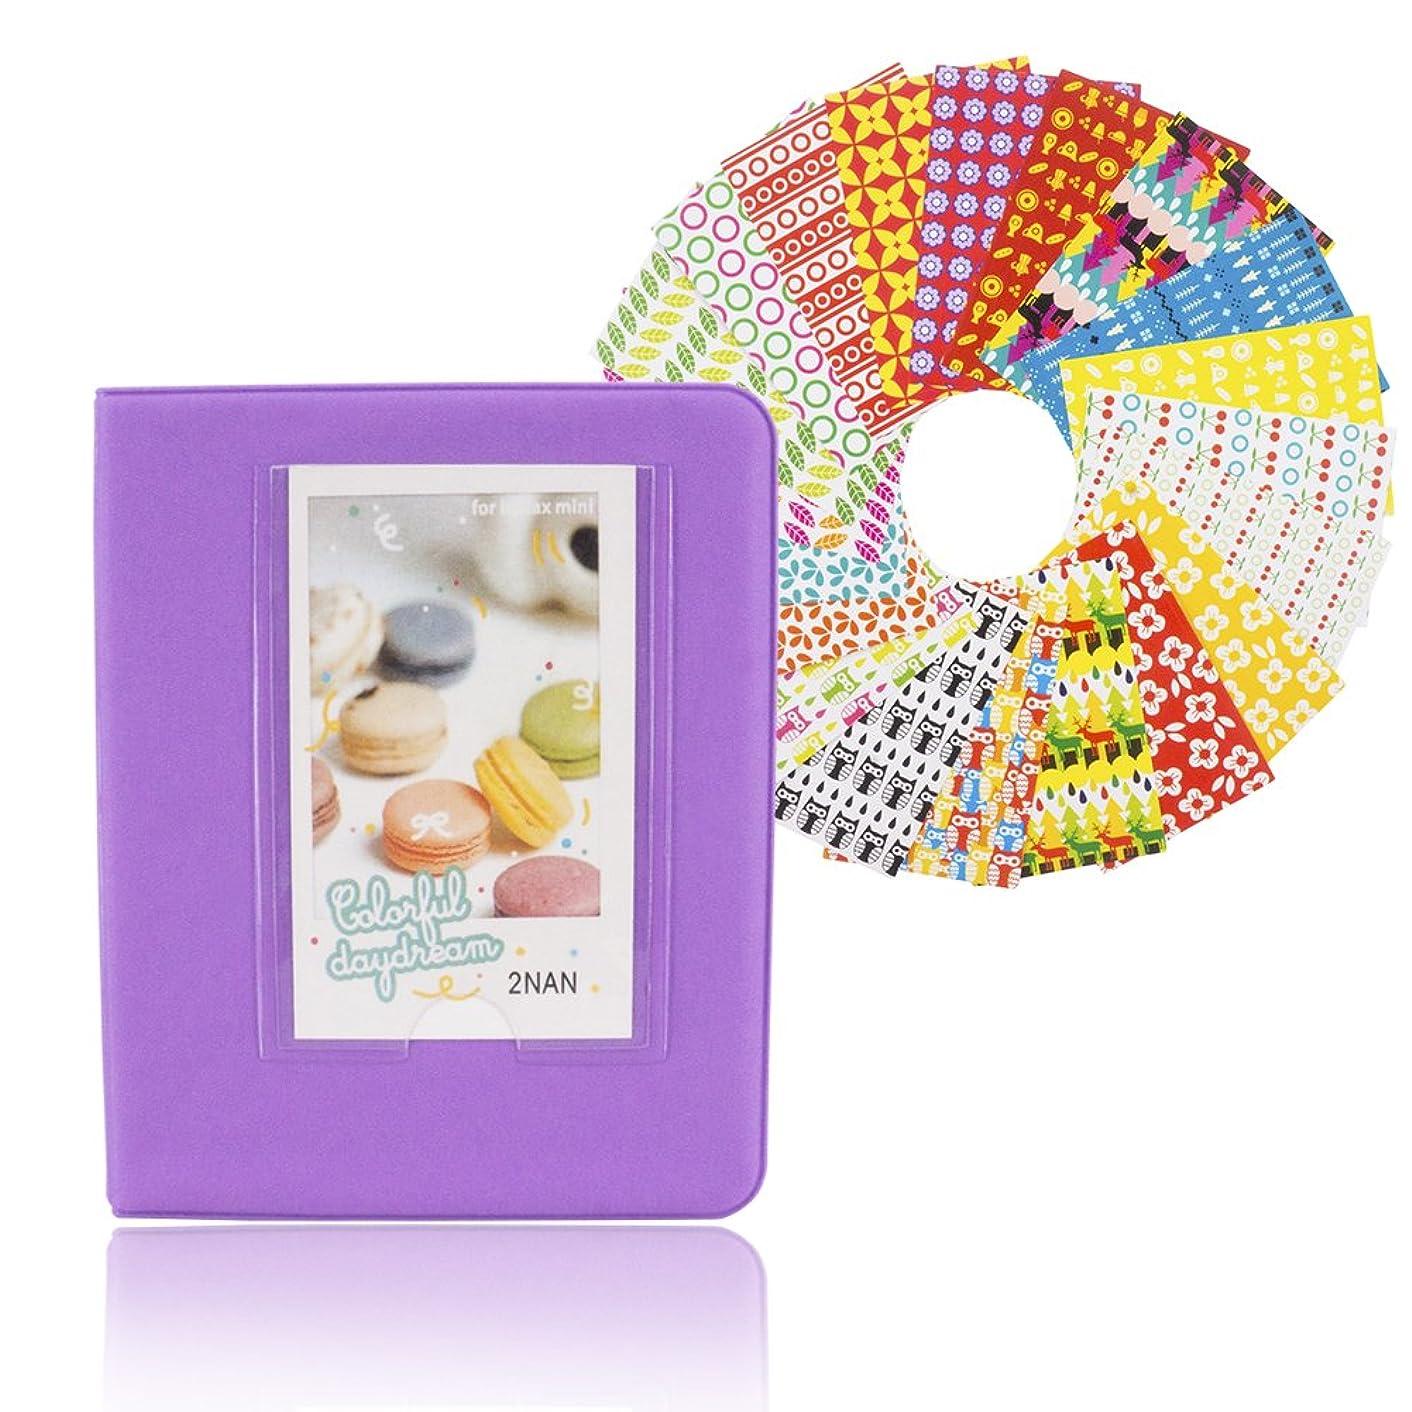 64 Pockets Intax Mini Photo Film Album 20 Picture Sticker Frame - Pass Lanry Polaroid Instax Mini 8 8+ 9 7s 25 50s 90 Photo Album Name Card Holder & Stickers